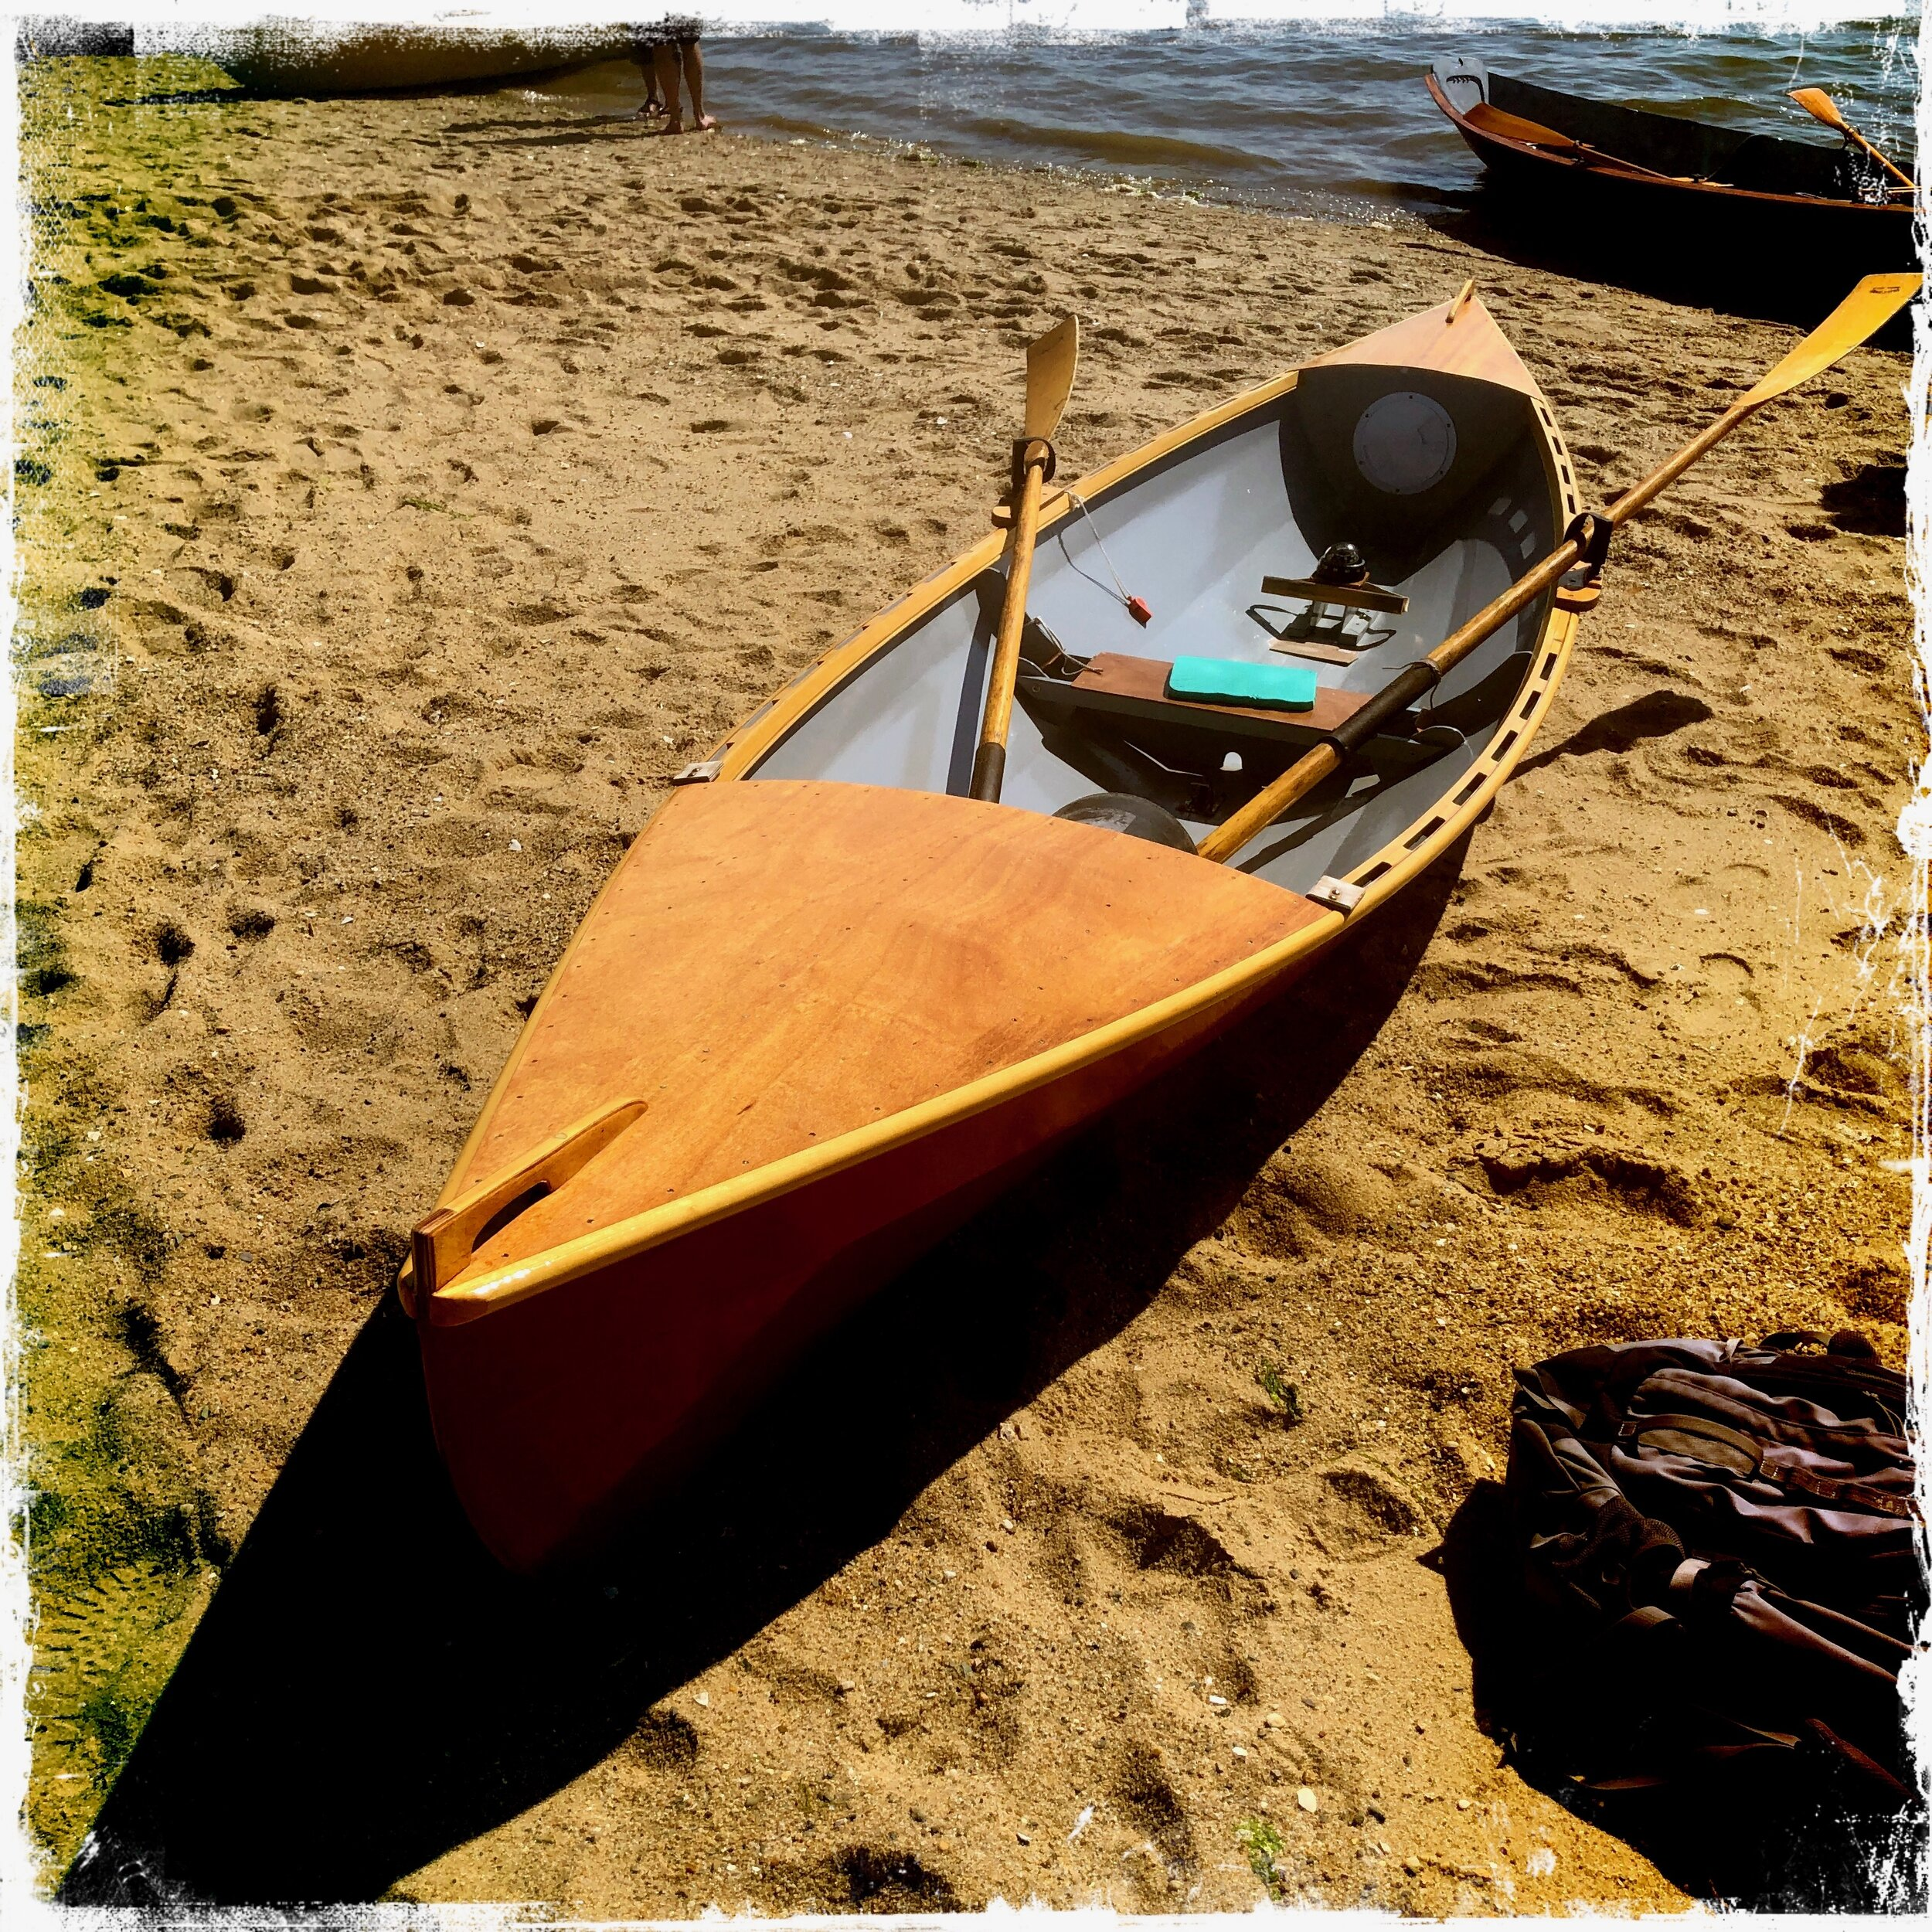 Jon Aborn's latest design- notice the plywood end decks, grab handles,  Gaco oarlocks,  open rails, rowing compass, spoon blade oars, whistle…